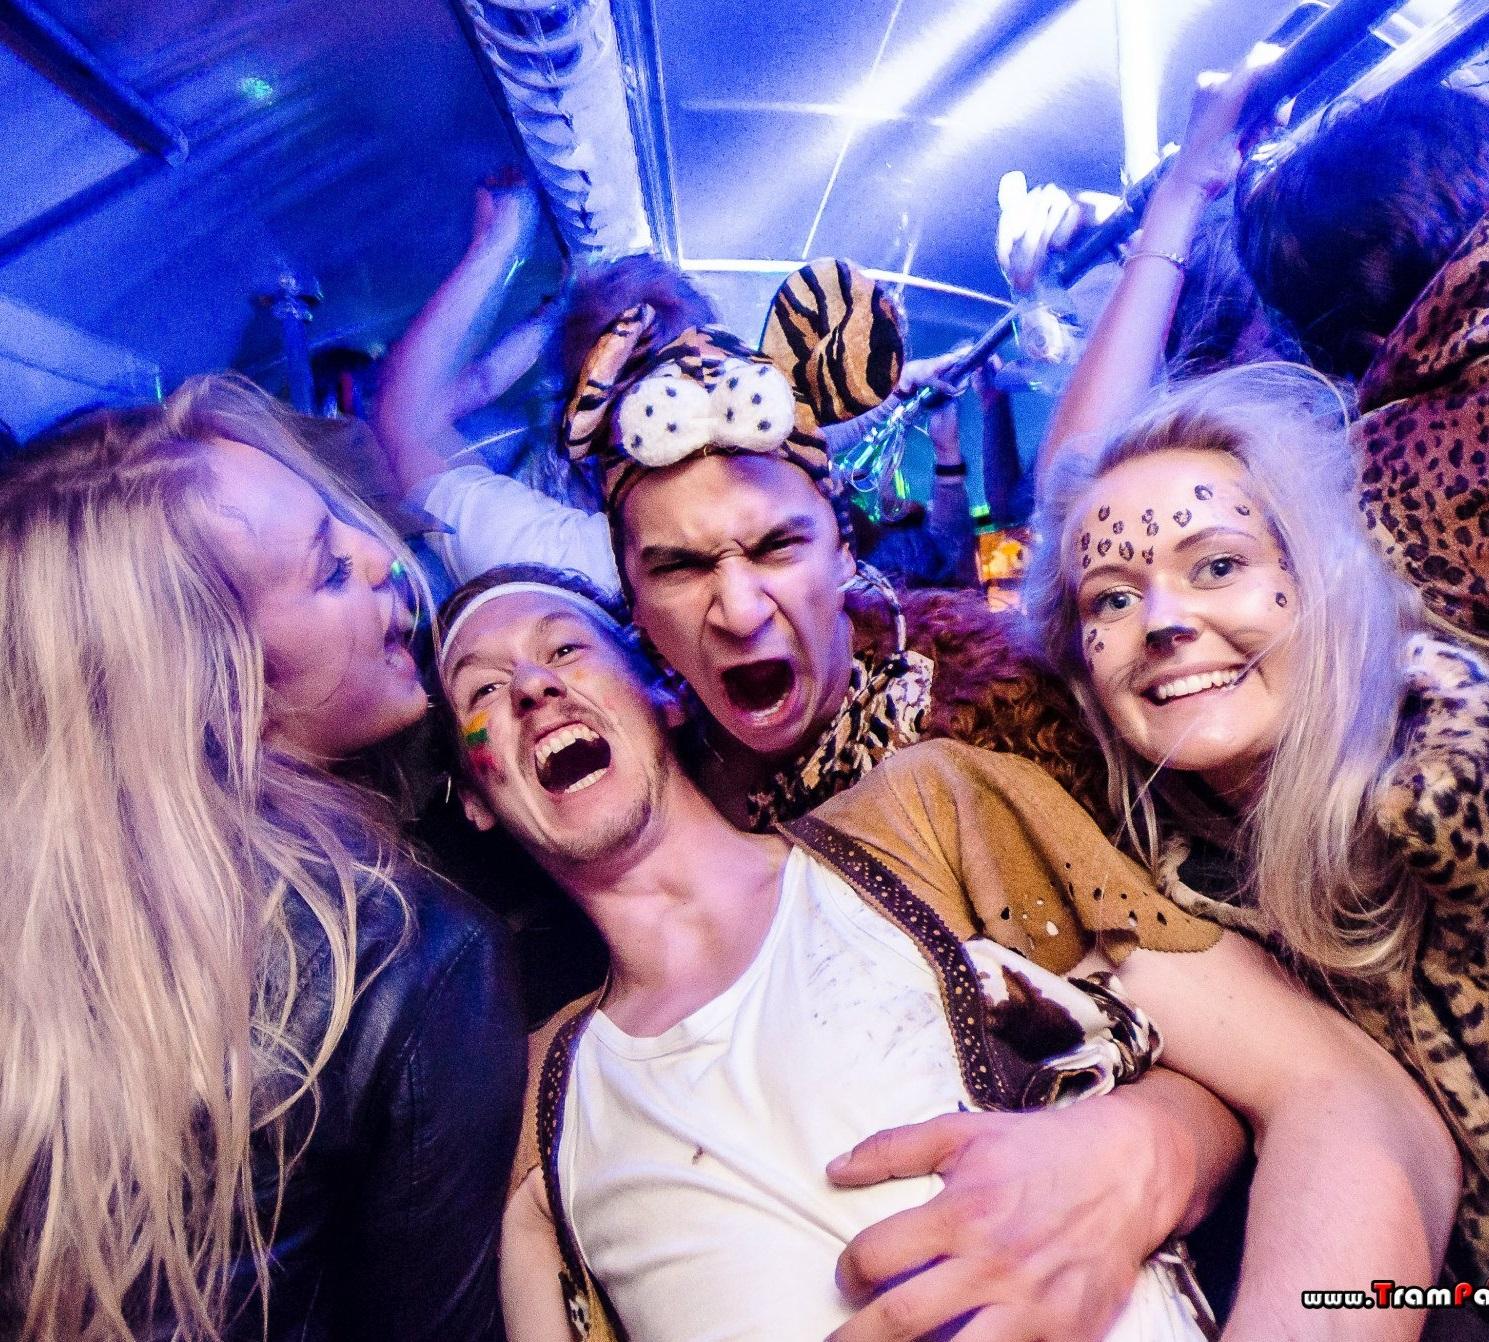 3 tägiger Party-Urlaub in Krakau inkl. Flug (ab Dortmund)